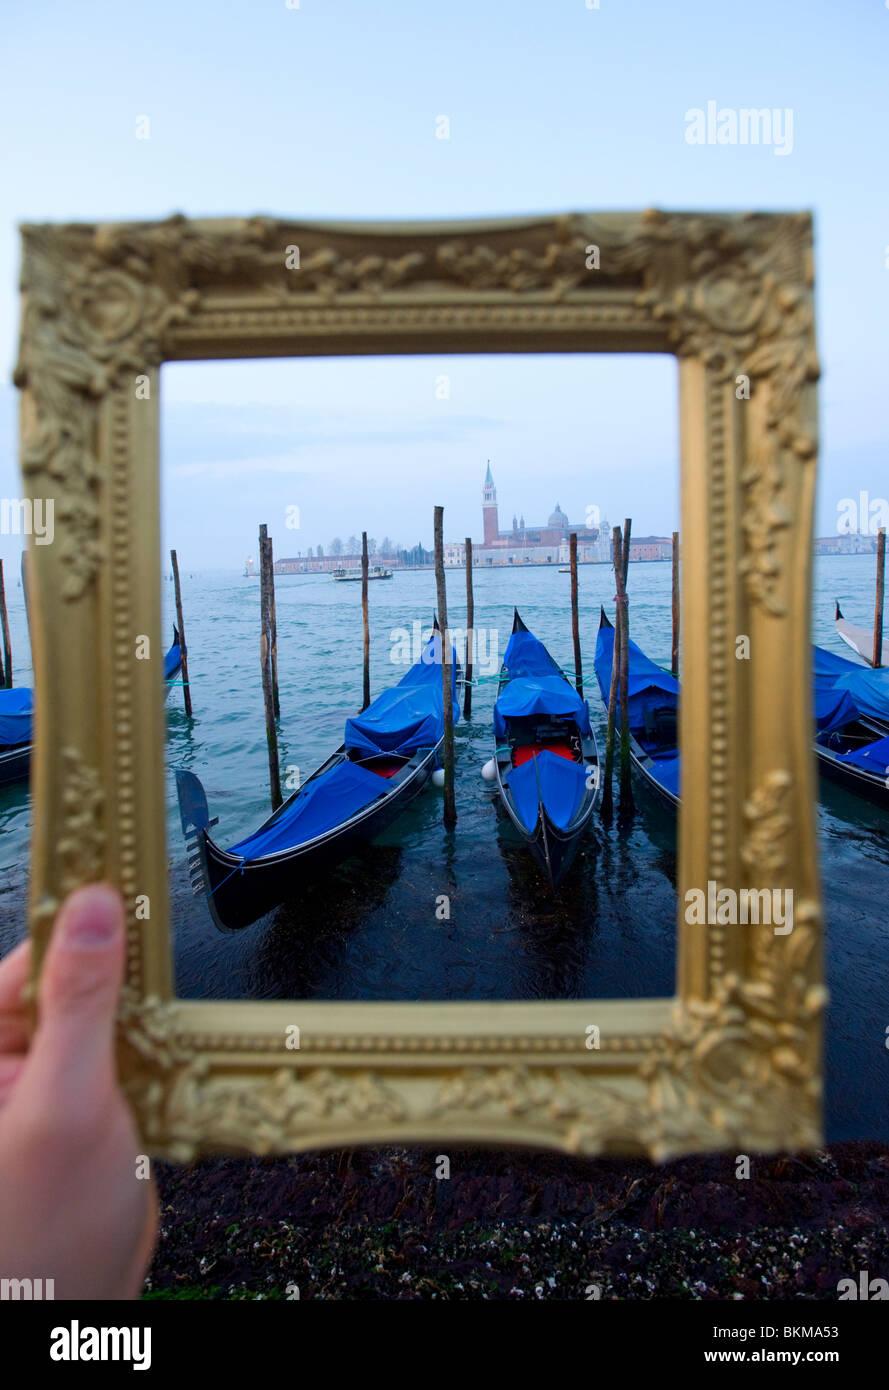 Canal Grande und Gondeln im Morgengrauen gerahmt in Bilderrahmen in Venedig Italien Stockbild